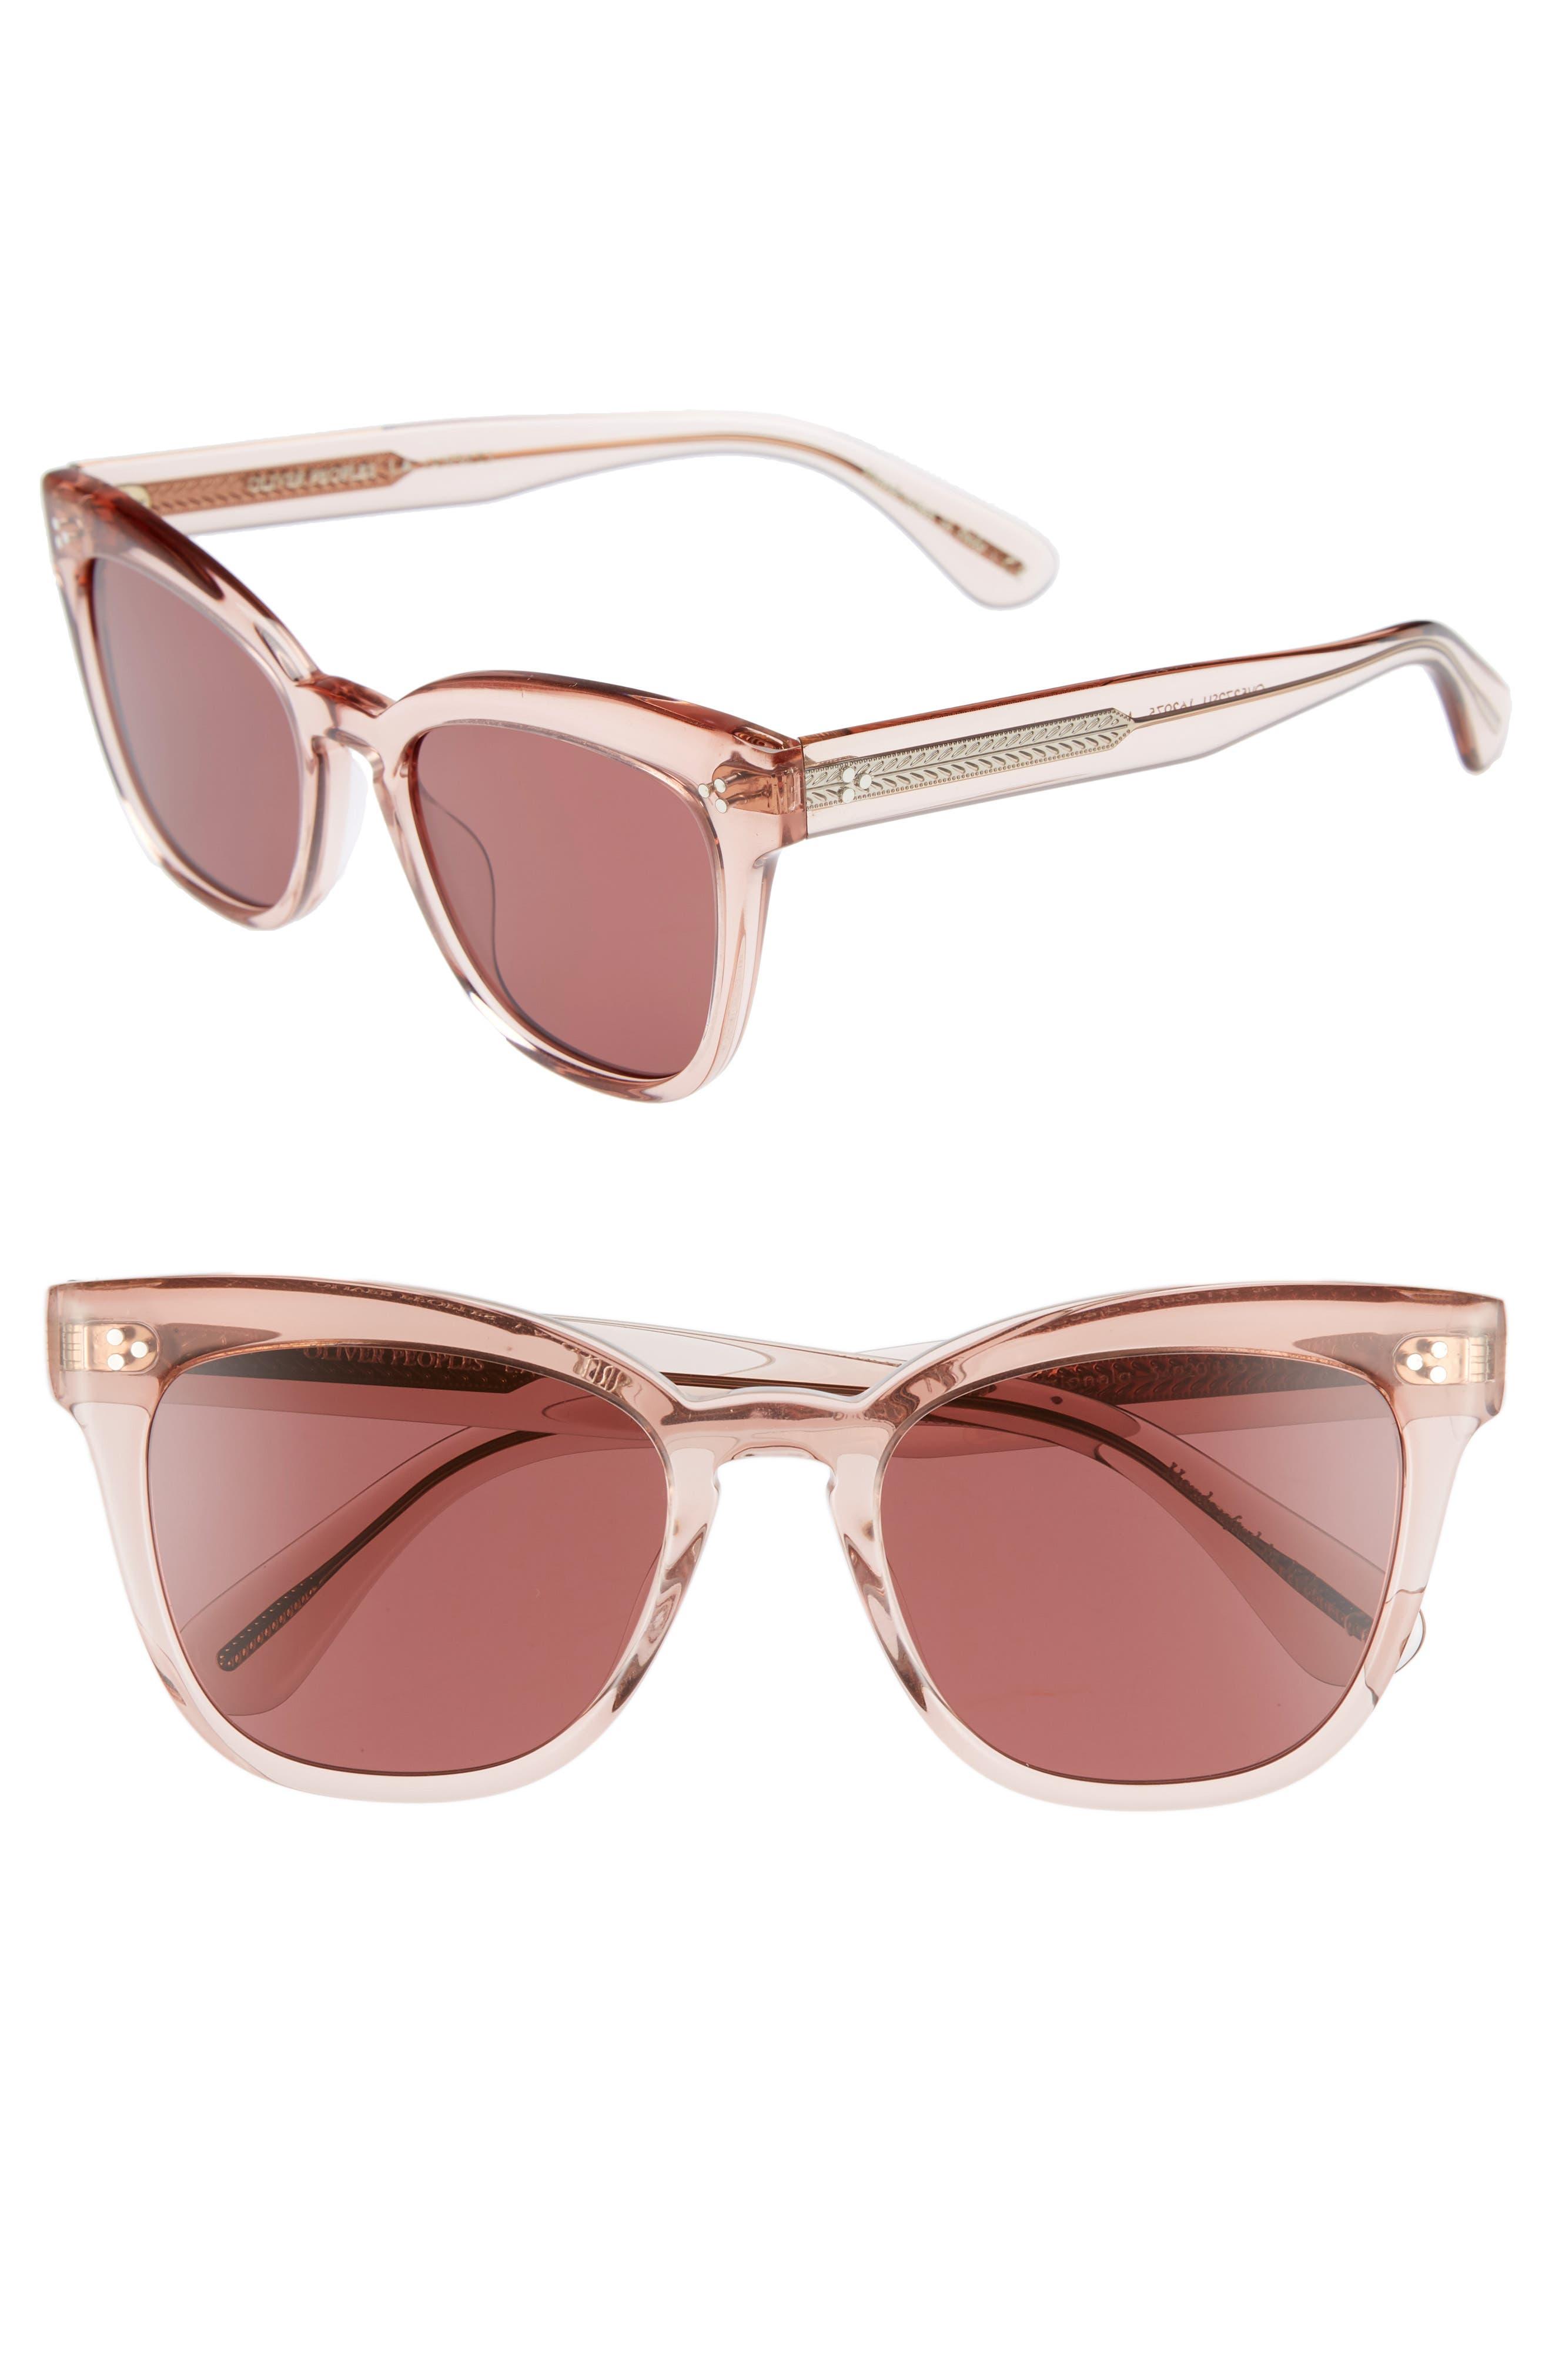 OLIVER PEOPLES,                             Marianela 54mm Cat Eye Sunglasses,                             Main thumbnail 1, color,                             WASHED ROSE